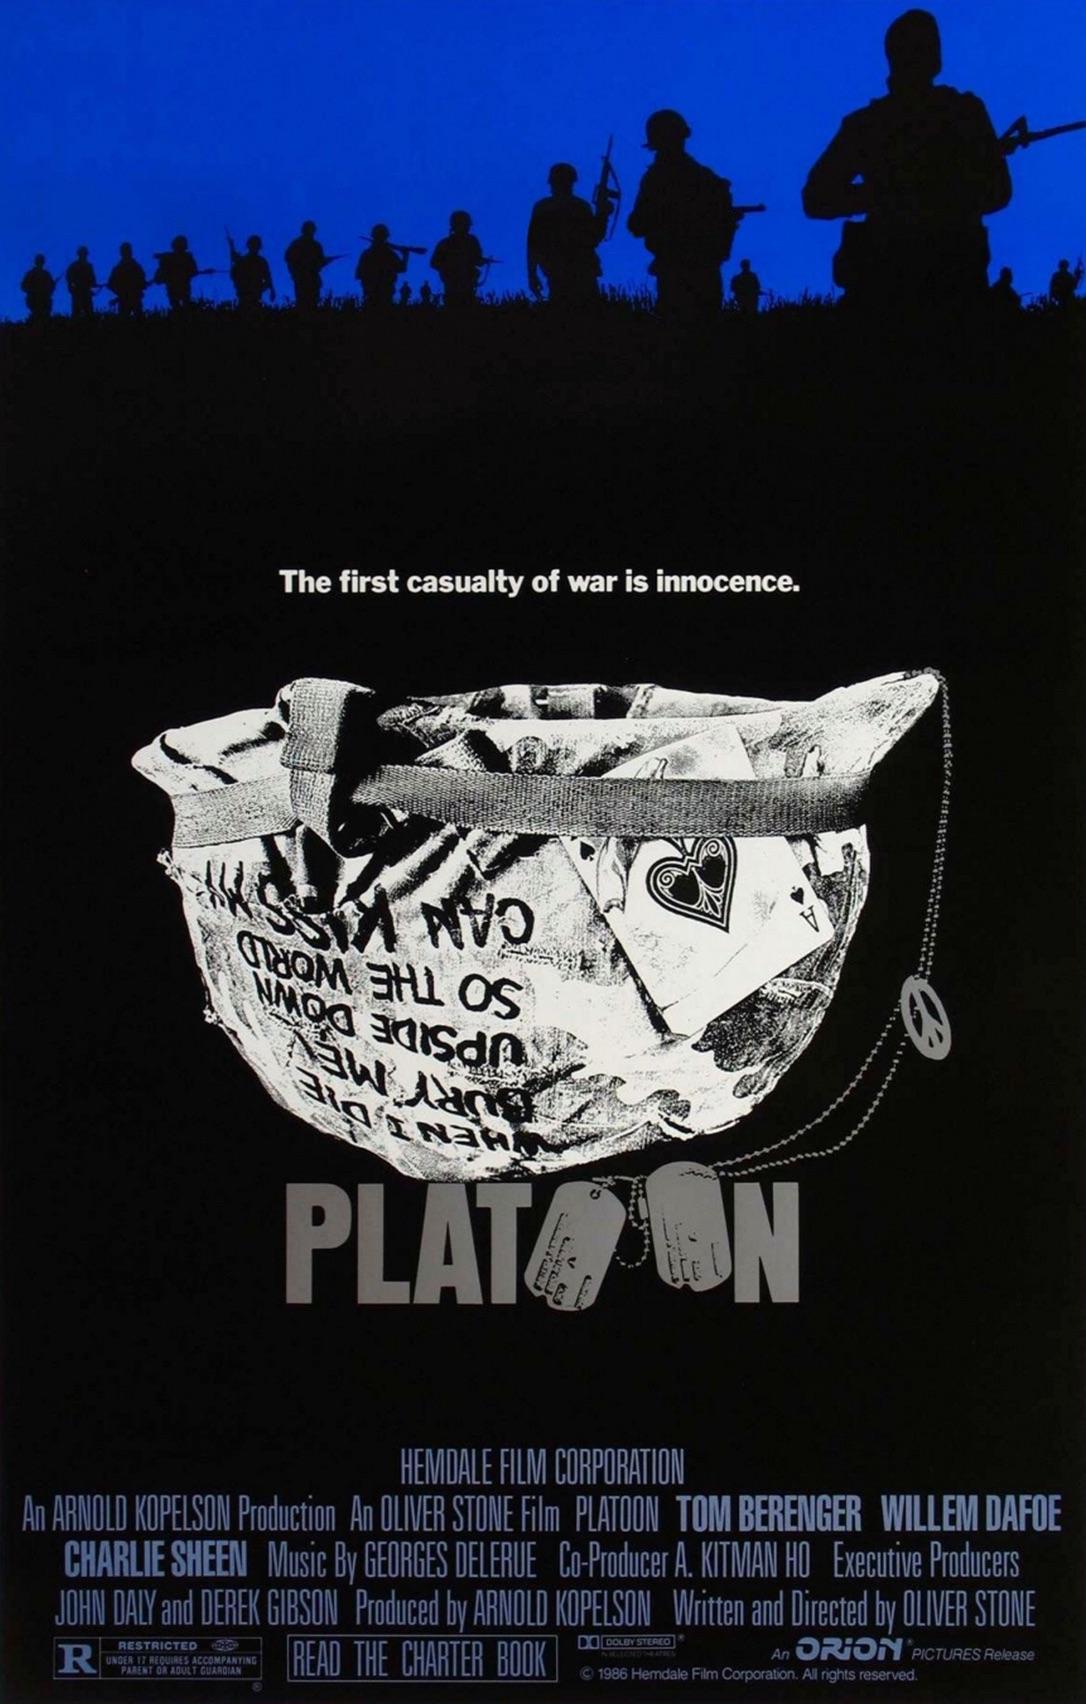 platooon-poster.jpg